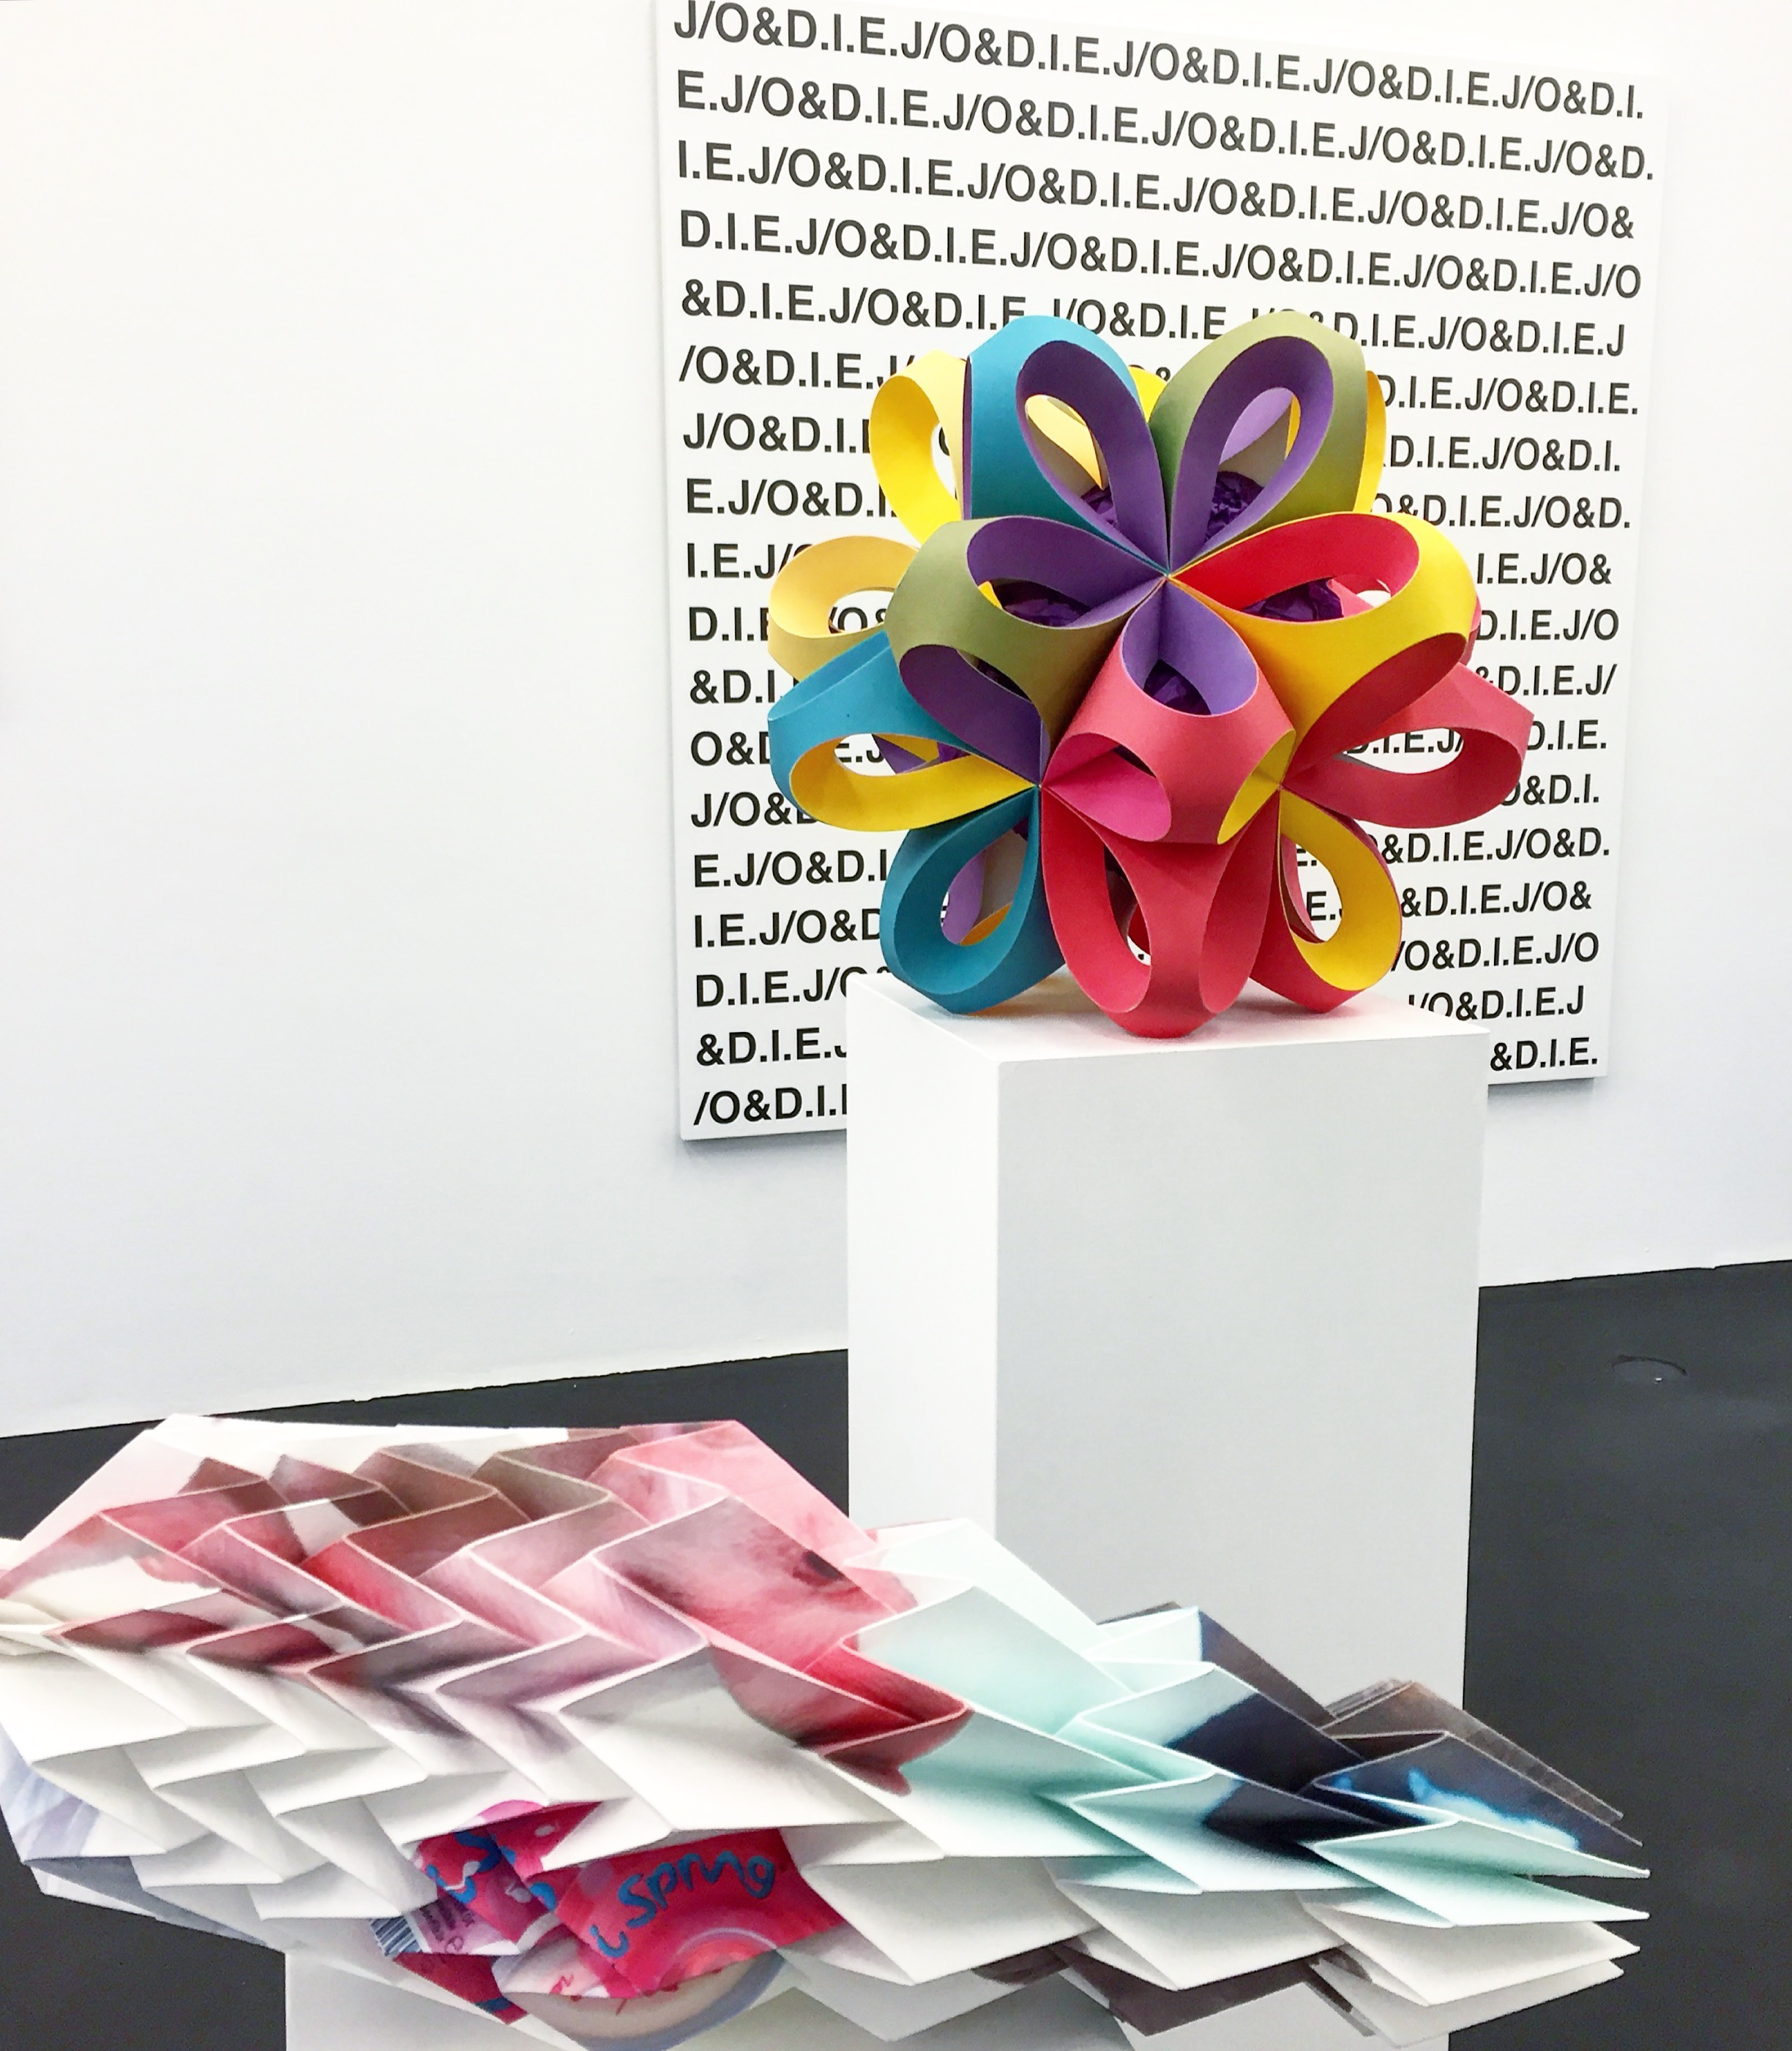 Exhibition view of Tobias Rehberger's exhibition presently at galerie neugerriemschneider. Courtesy Diana d'Arenberg.